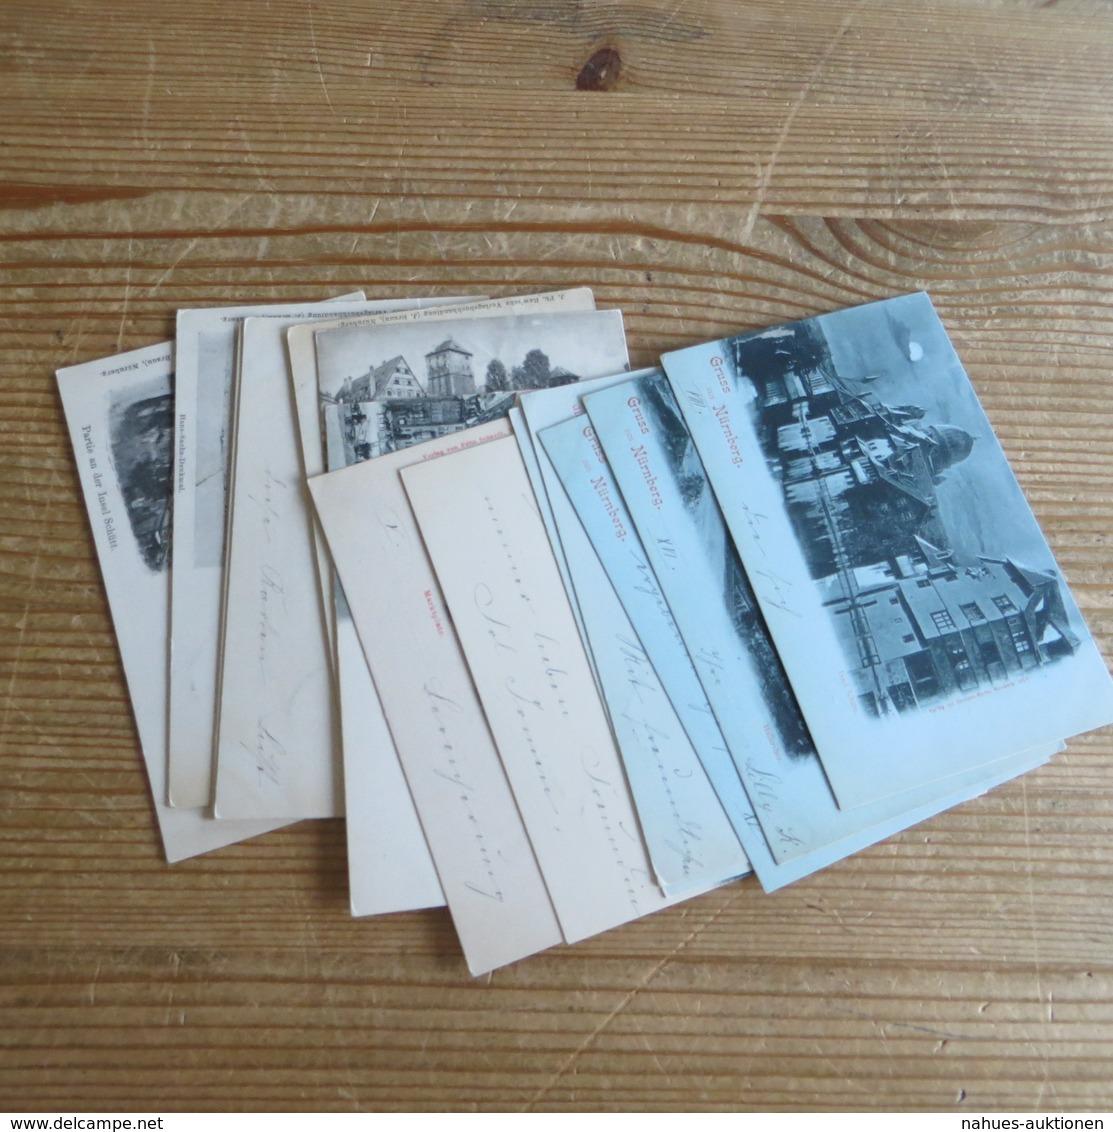 Ansichtskarten Sammlung Nürnberg Kettensendung An Eine Adresse Gesamt 14 Stück - 5 - 99 Karten